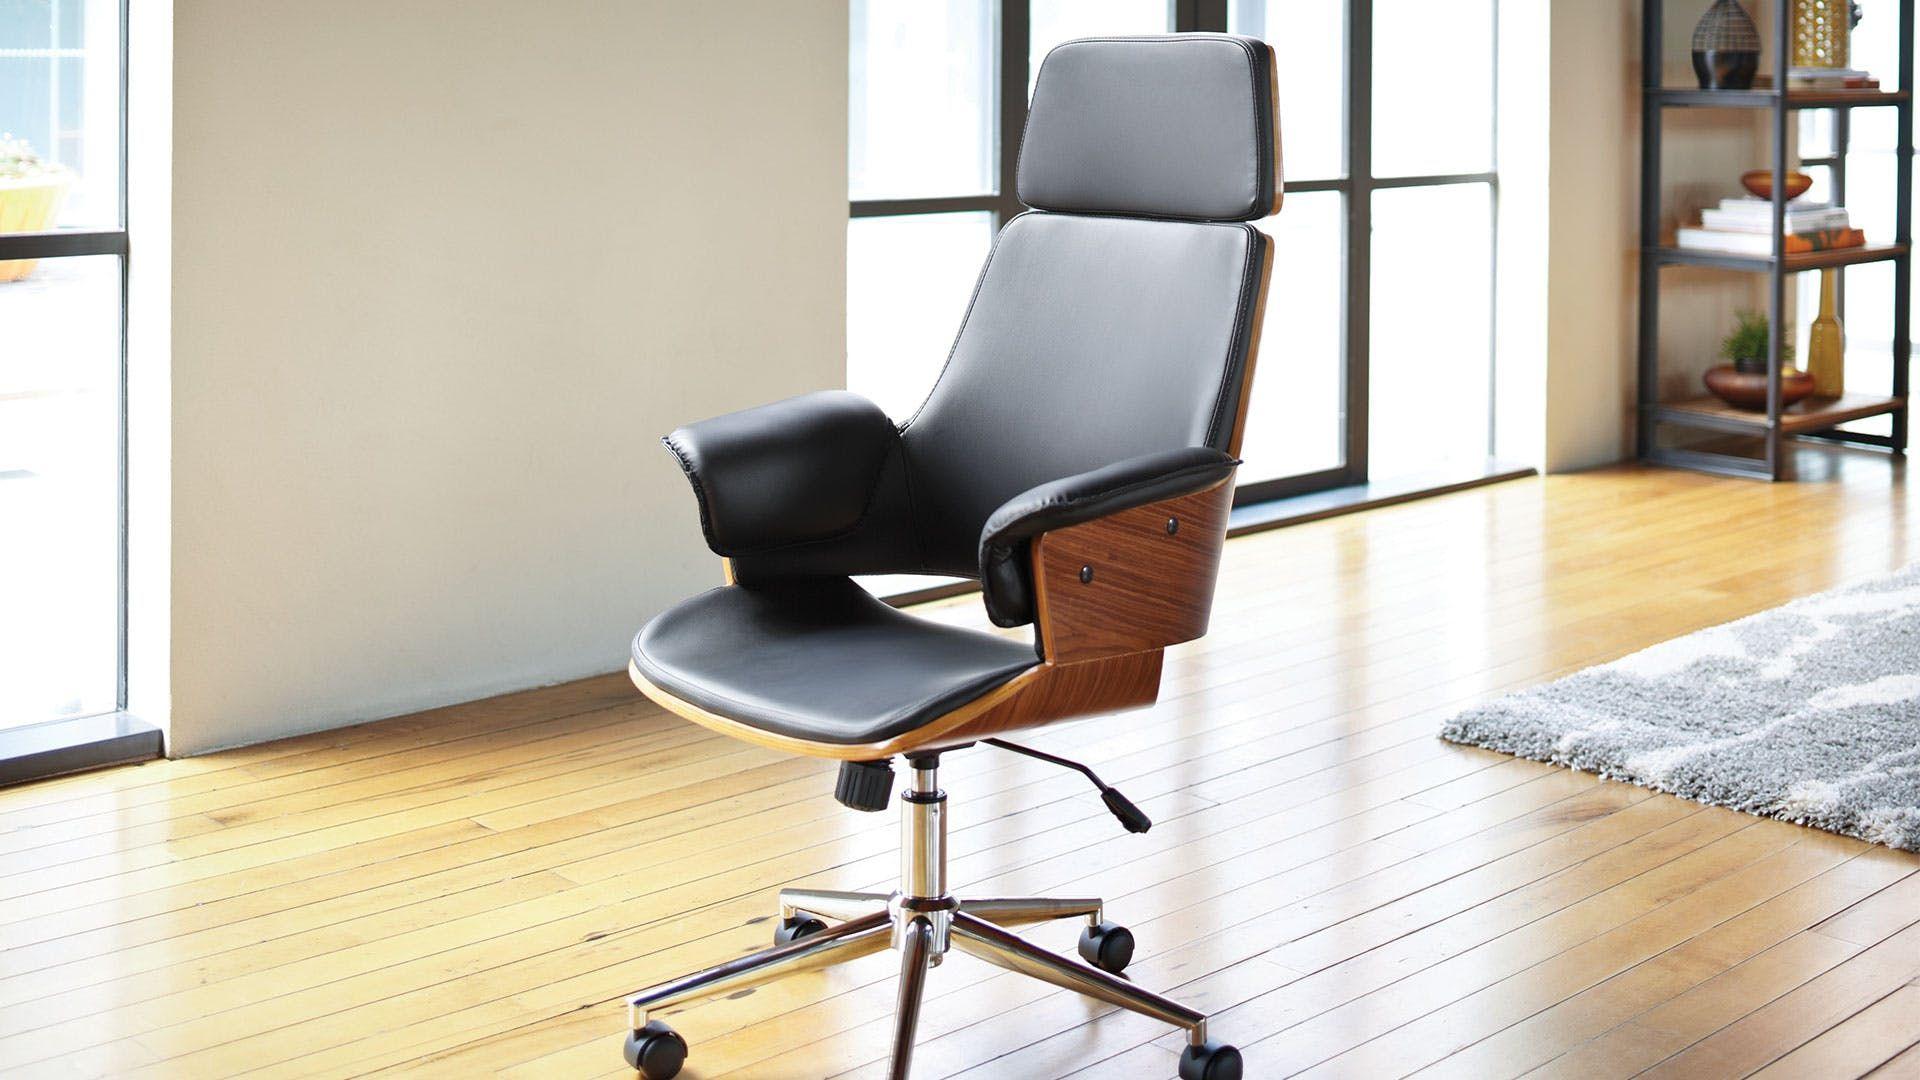 Top 10 Best Office Desk Chair Under 100 In 2019 Office Chair Best Office Chair Chair